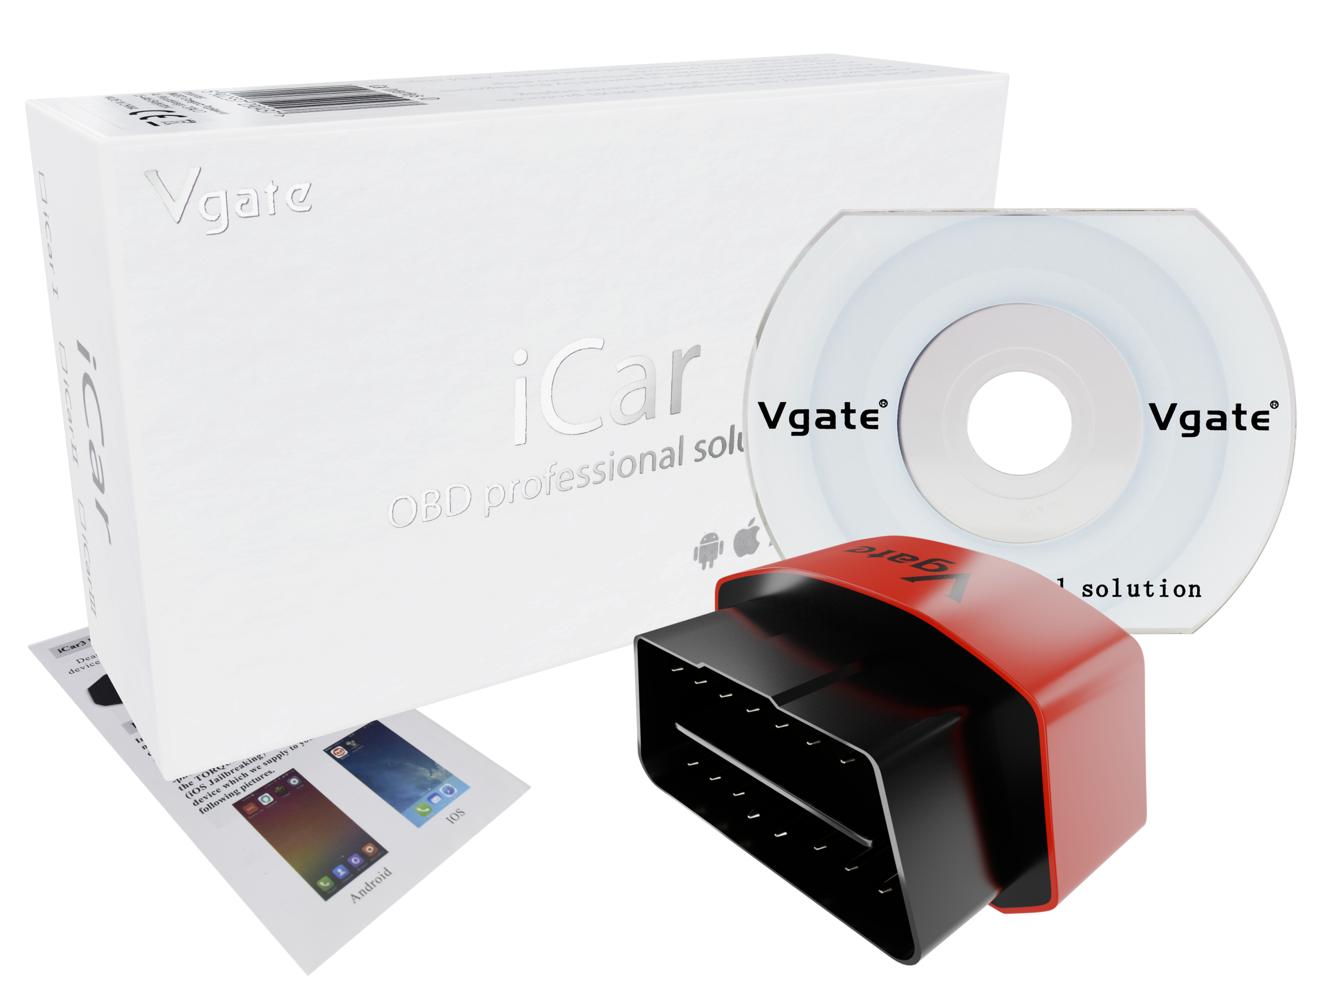 interfejs icar3 wifi obdii elm327 vgate wifi diagnostyka. Black Bedroom Furniture Sets. Home Design Ideas